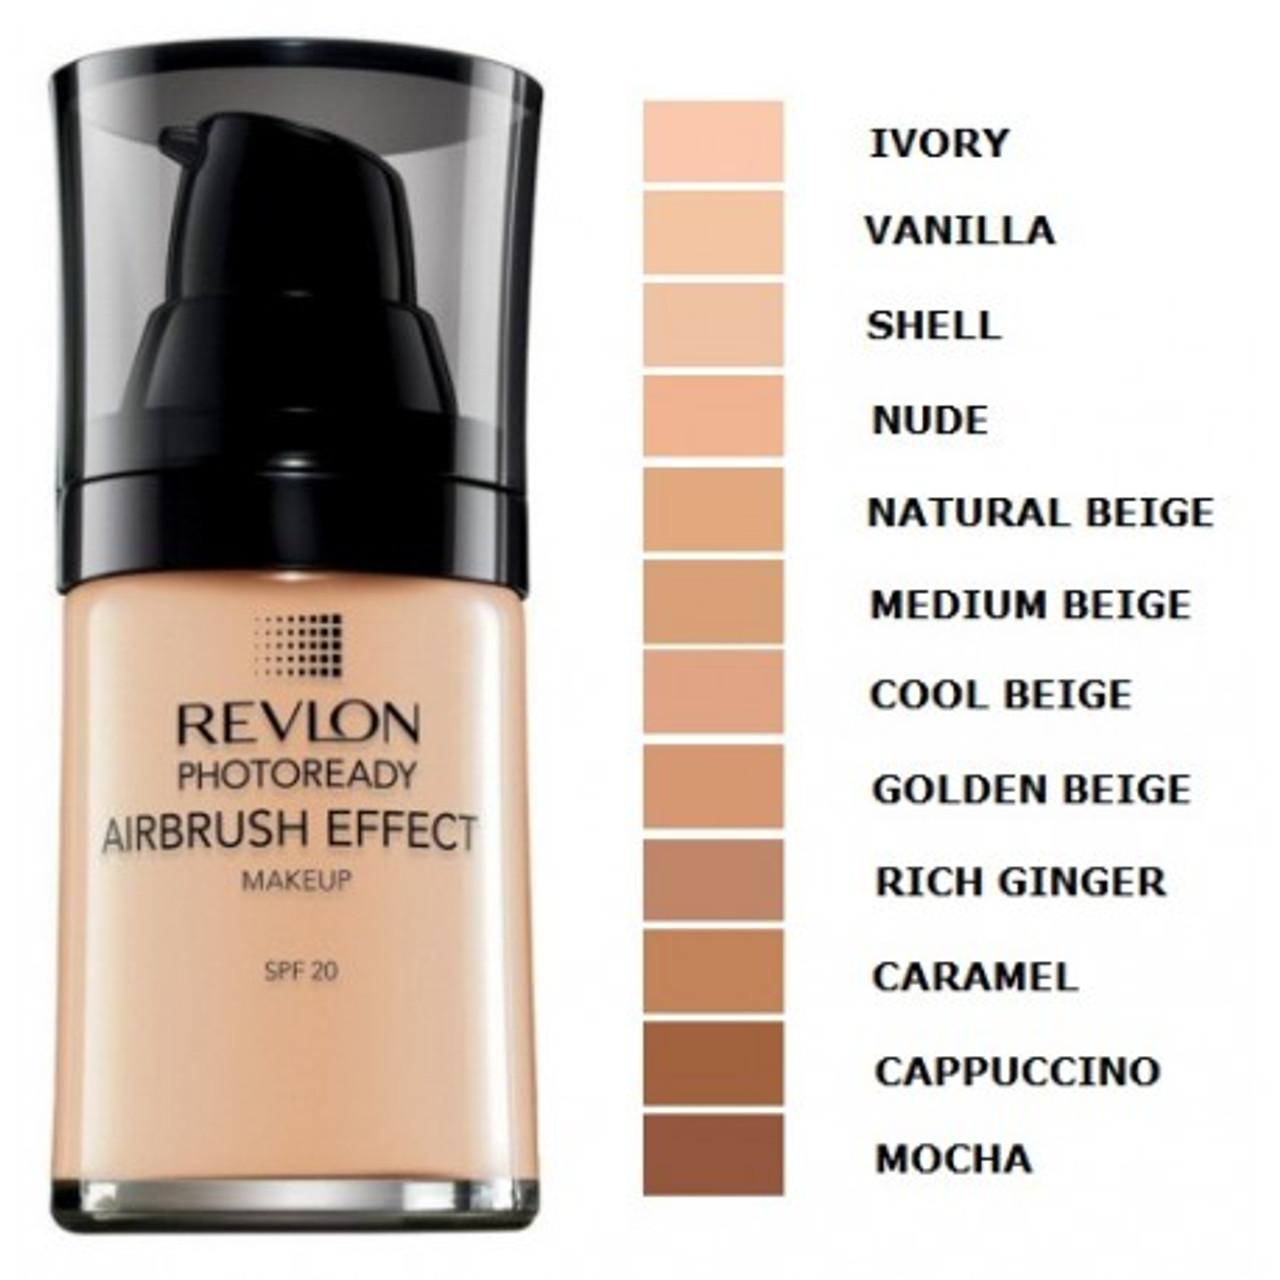 Revlon Photoready Airbrush Effect Makeup SPF 20, 1 oz - Nationwide